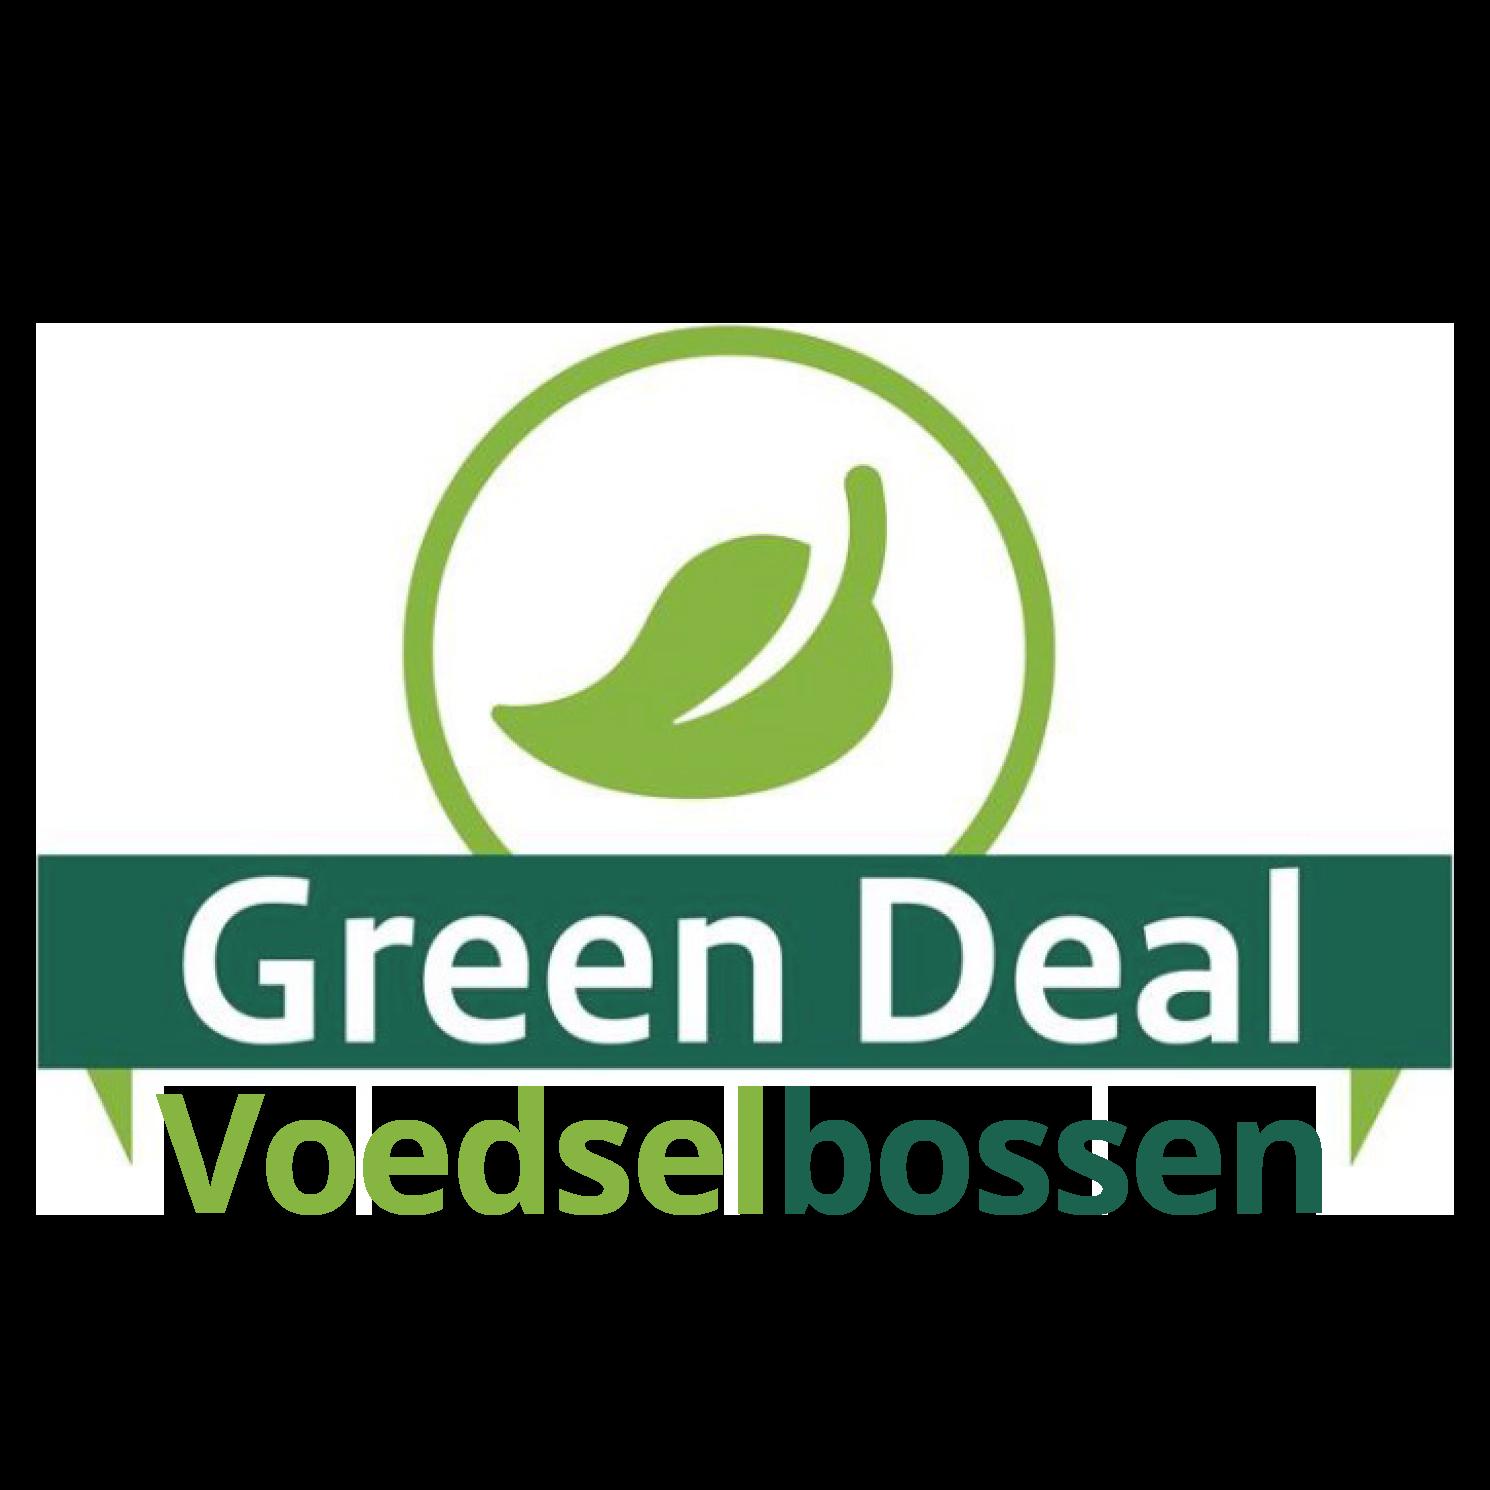 Green Deal Voedselbossen